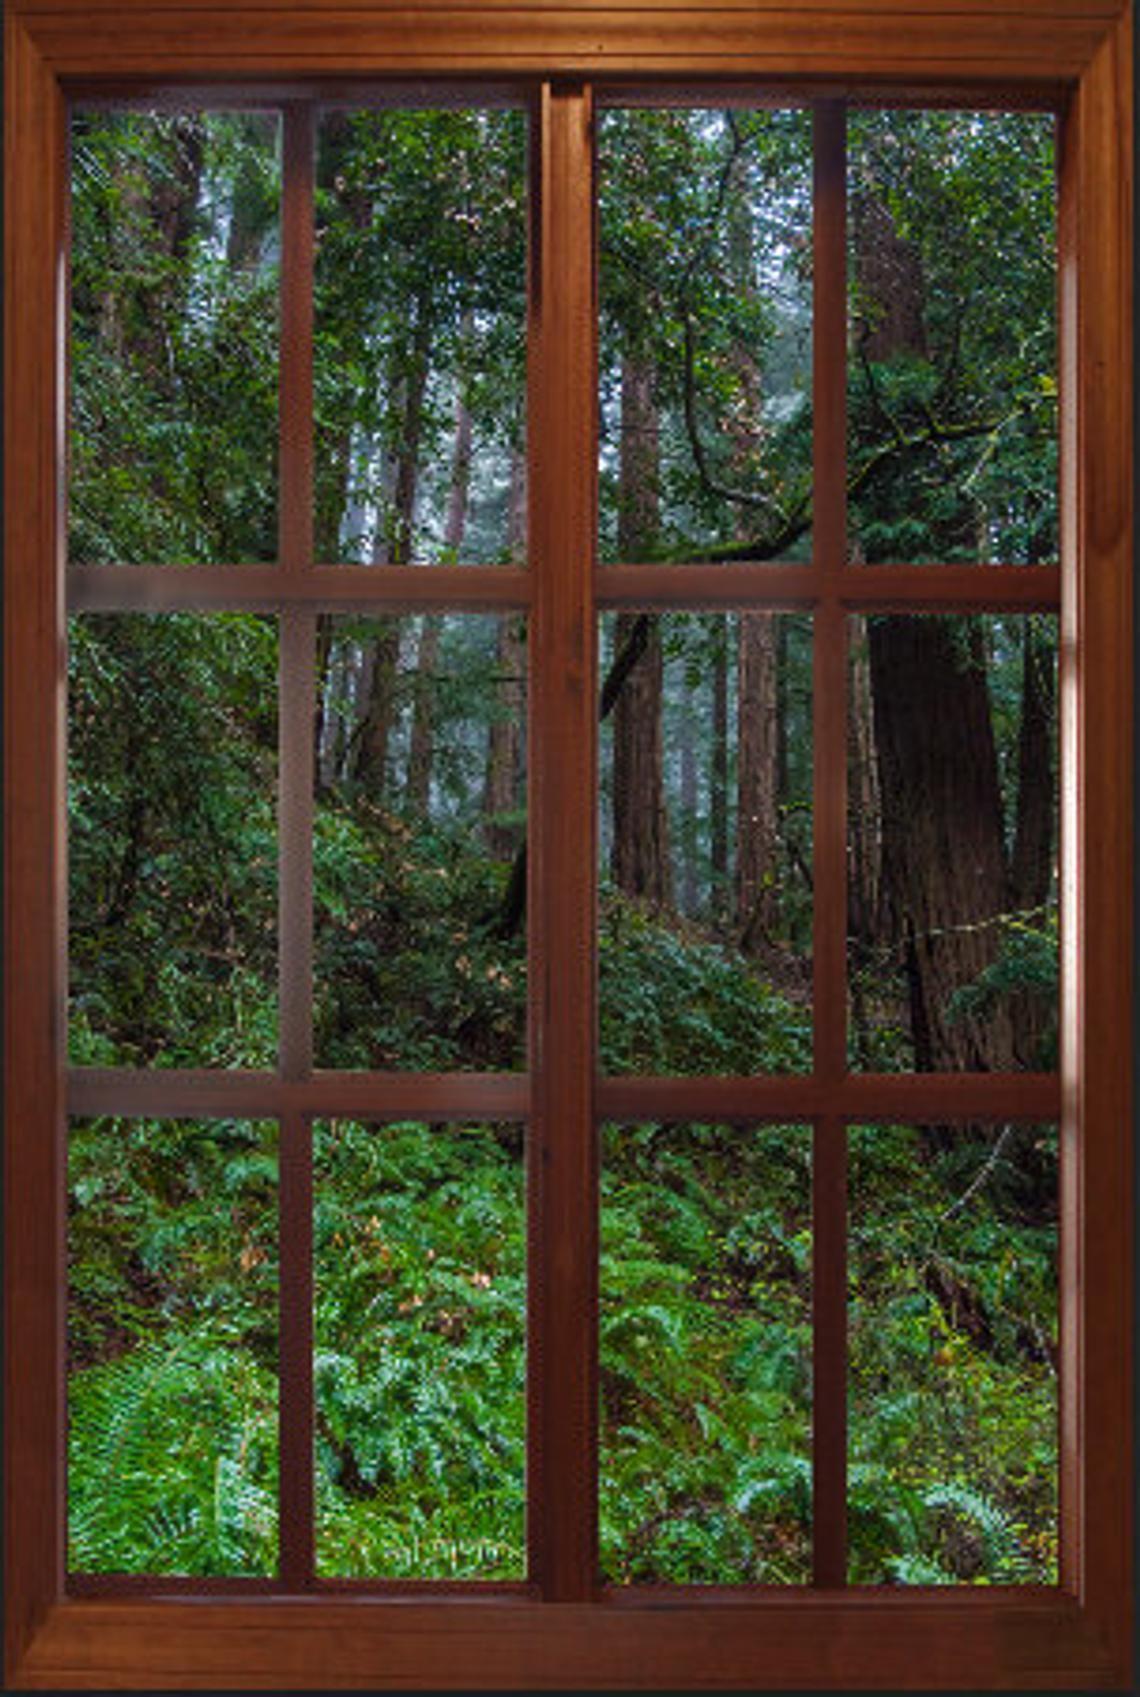 image 0 Wall murals, Faux window, Window view